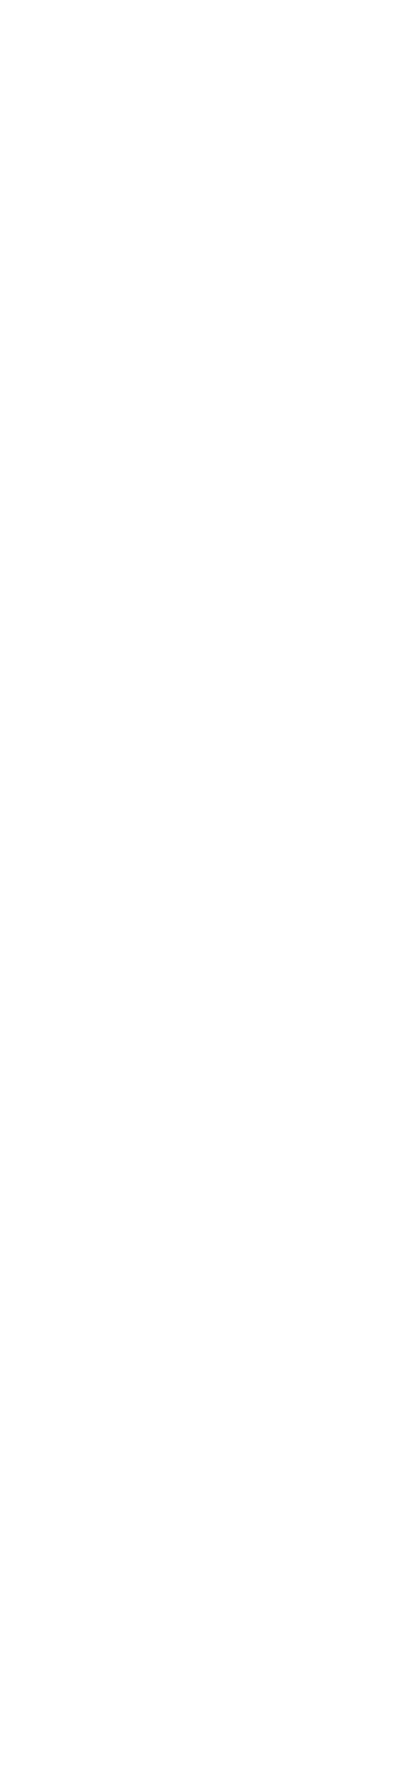 striscia bianca 2.png